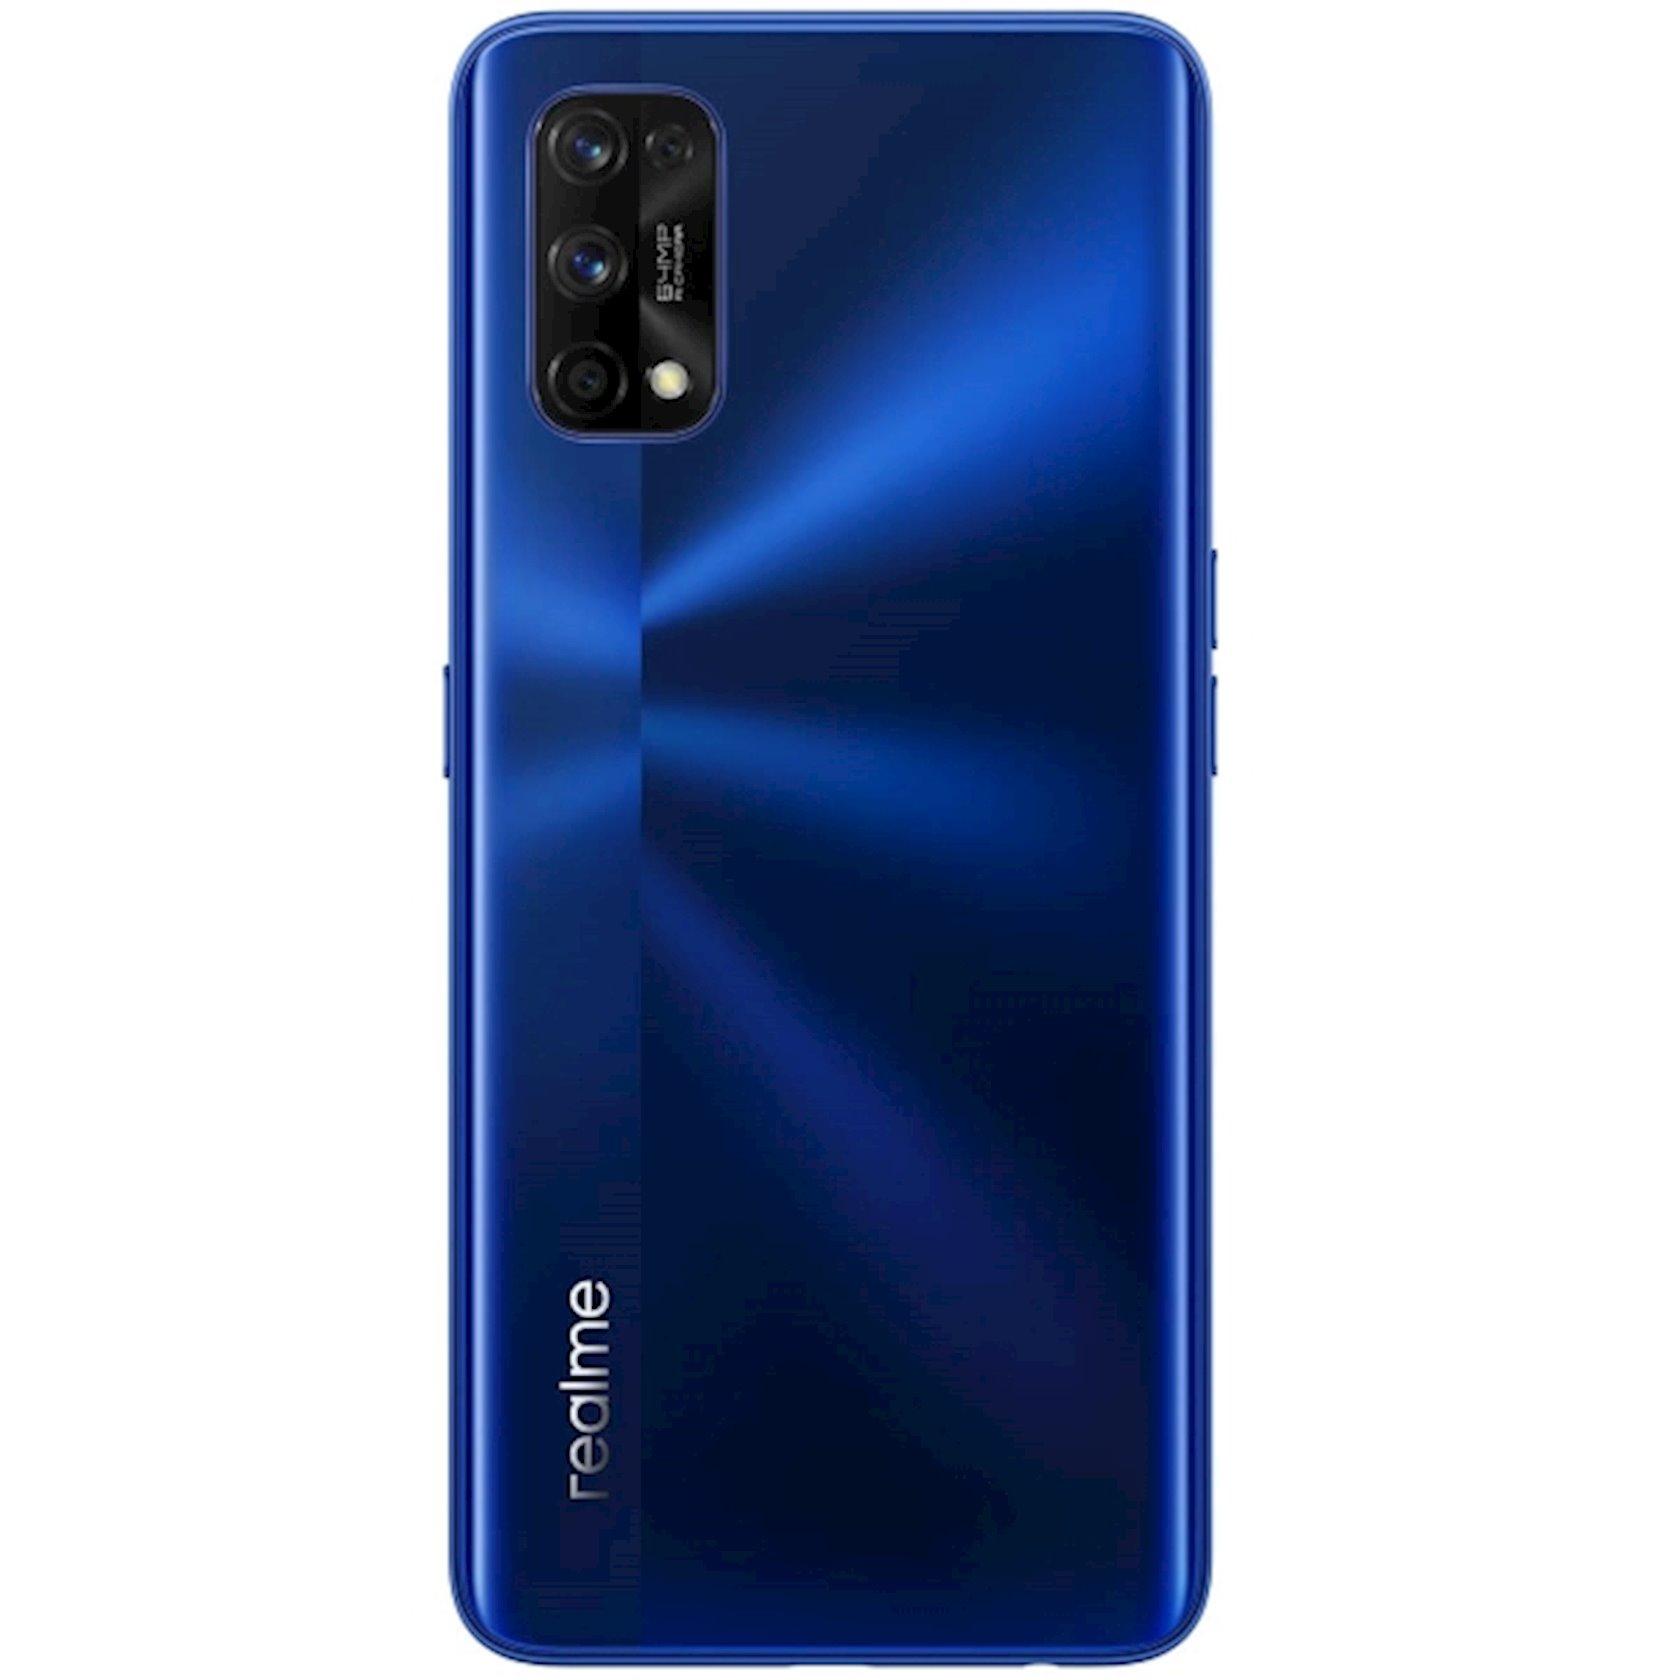 Smartfon Realme 7 Pro 2020 8GB/128GB Mirror Blue